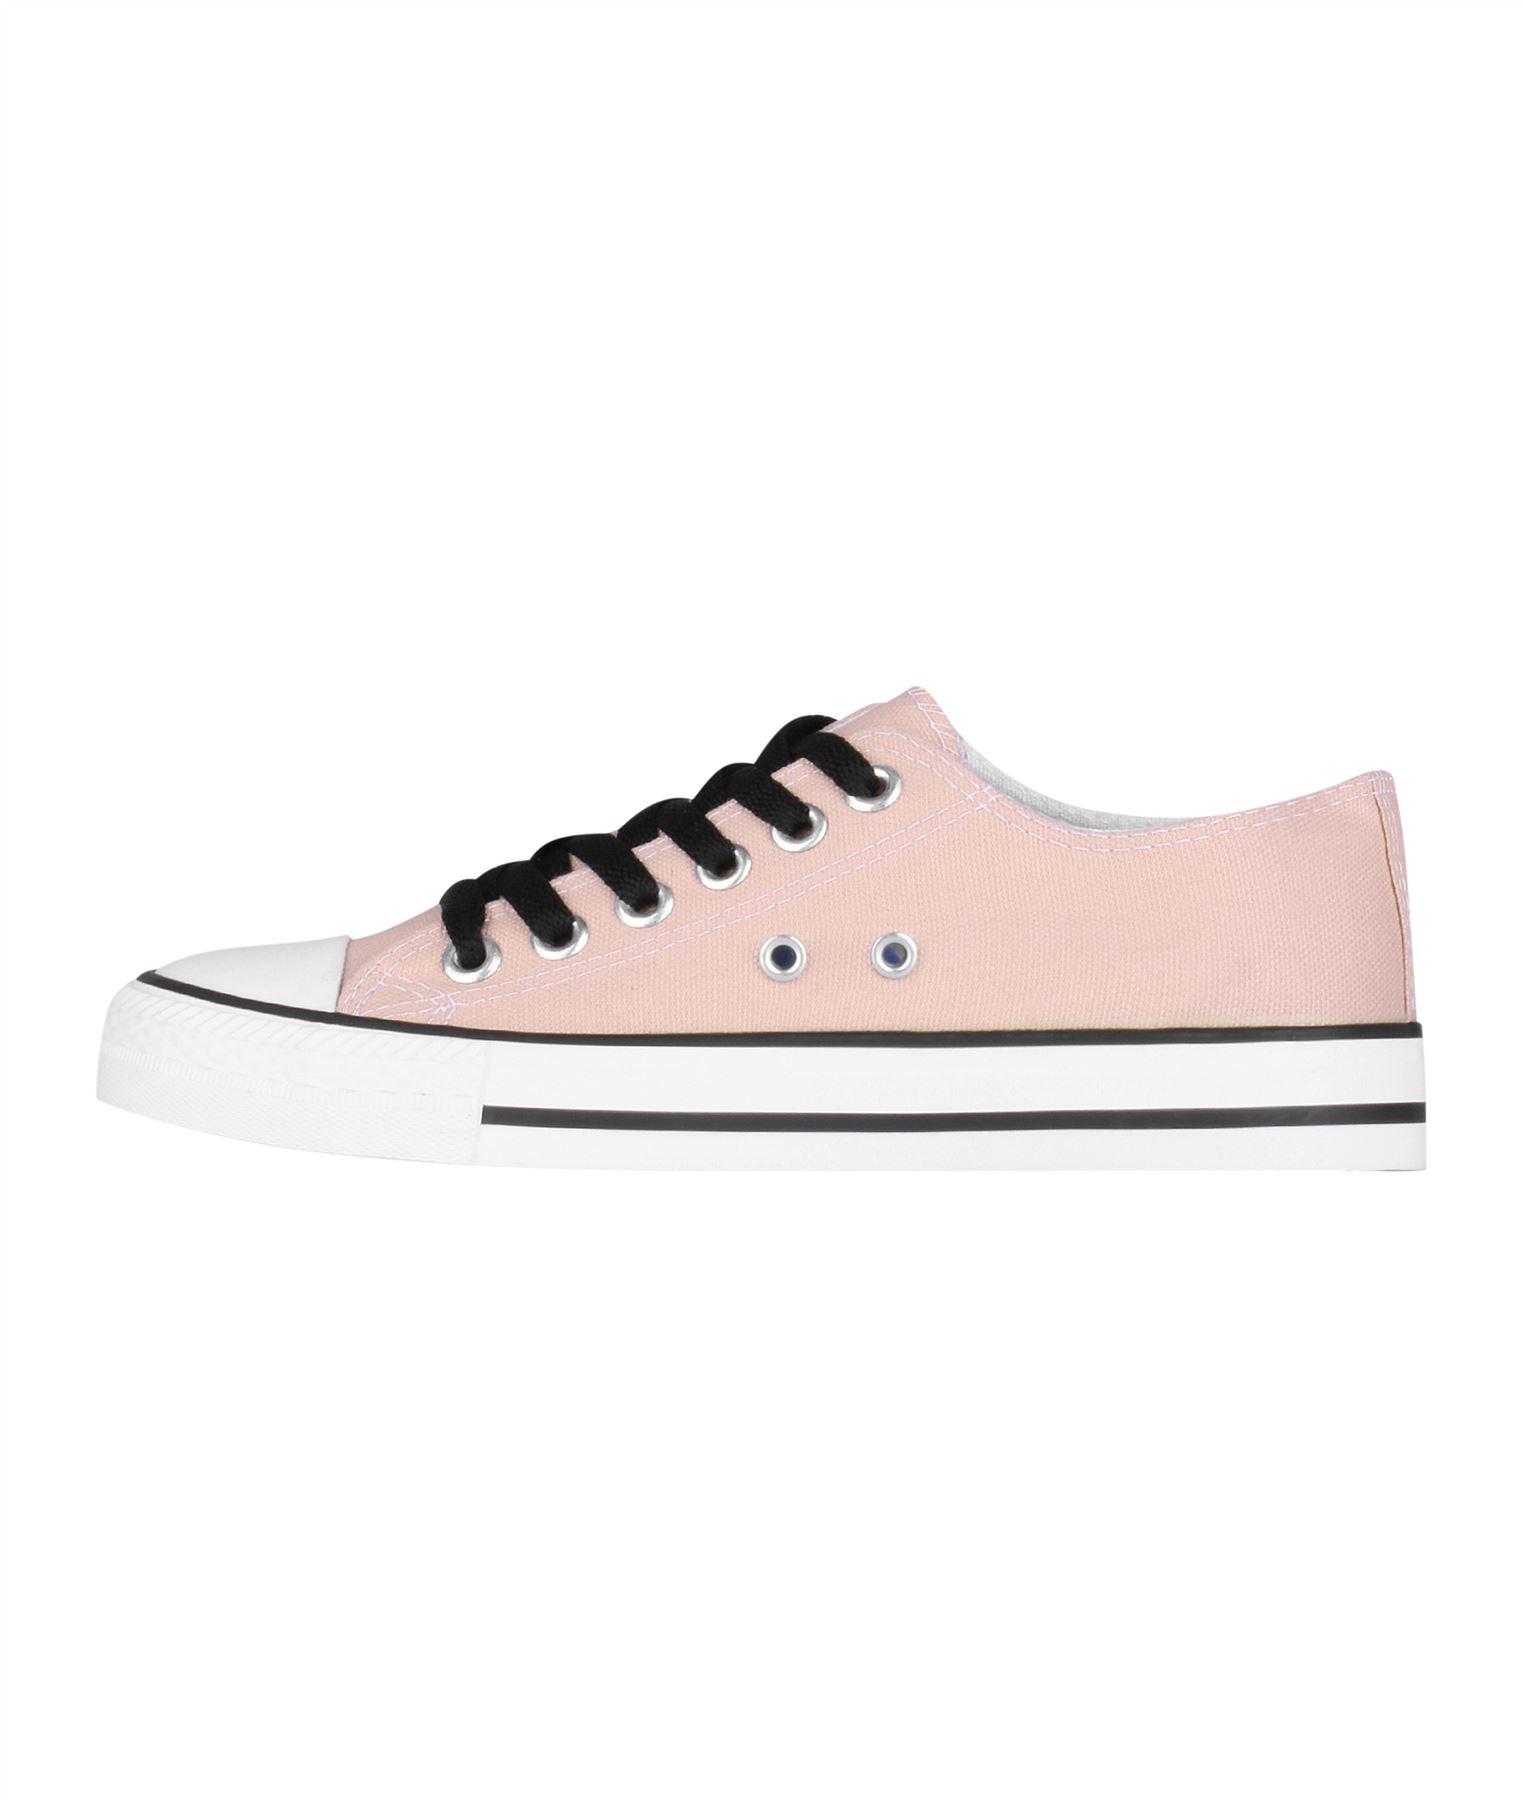 Zapatillas-Mujer-Casuales-Deportiva-Barata-Lona-Moda-Originales-Outlet-Tela-Moda miniatura 50